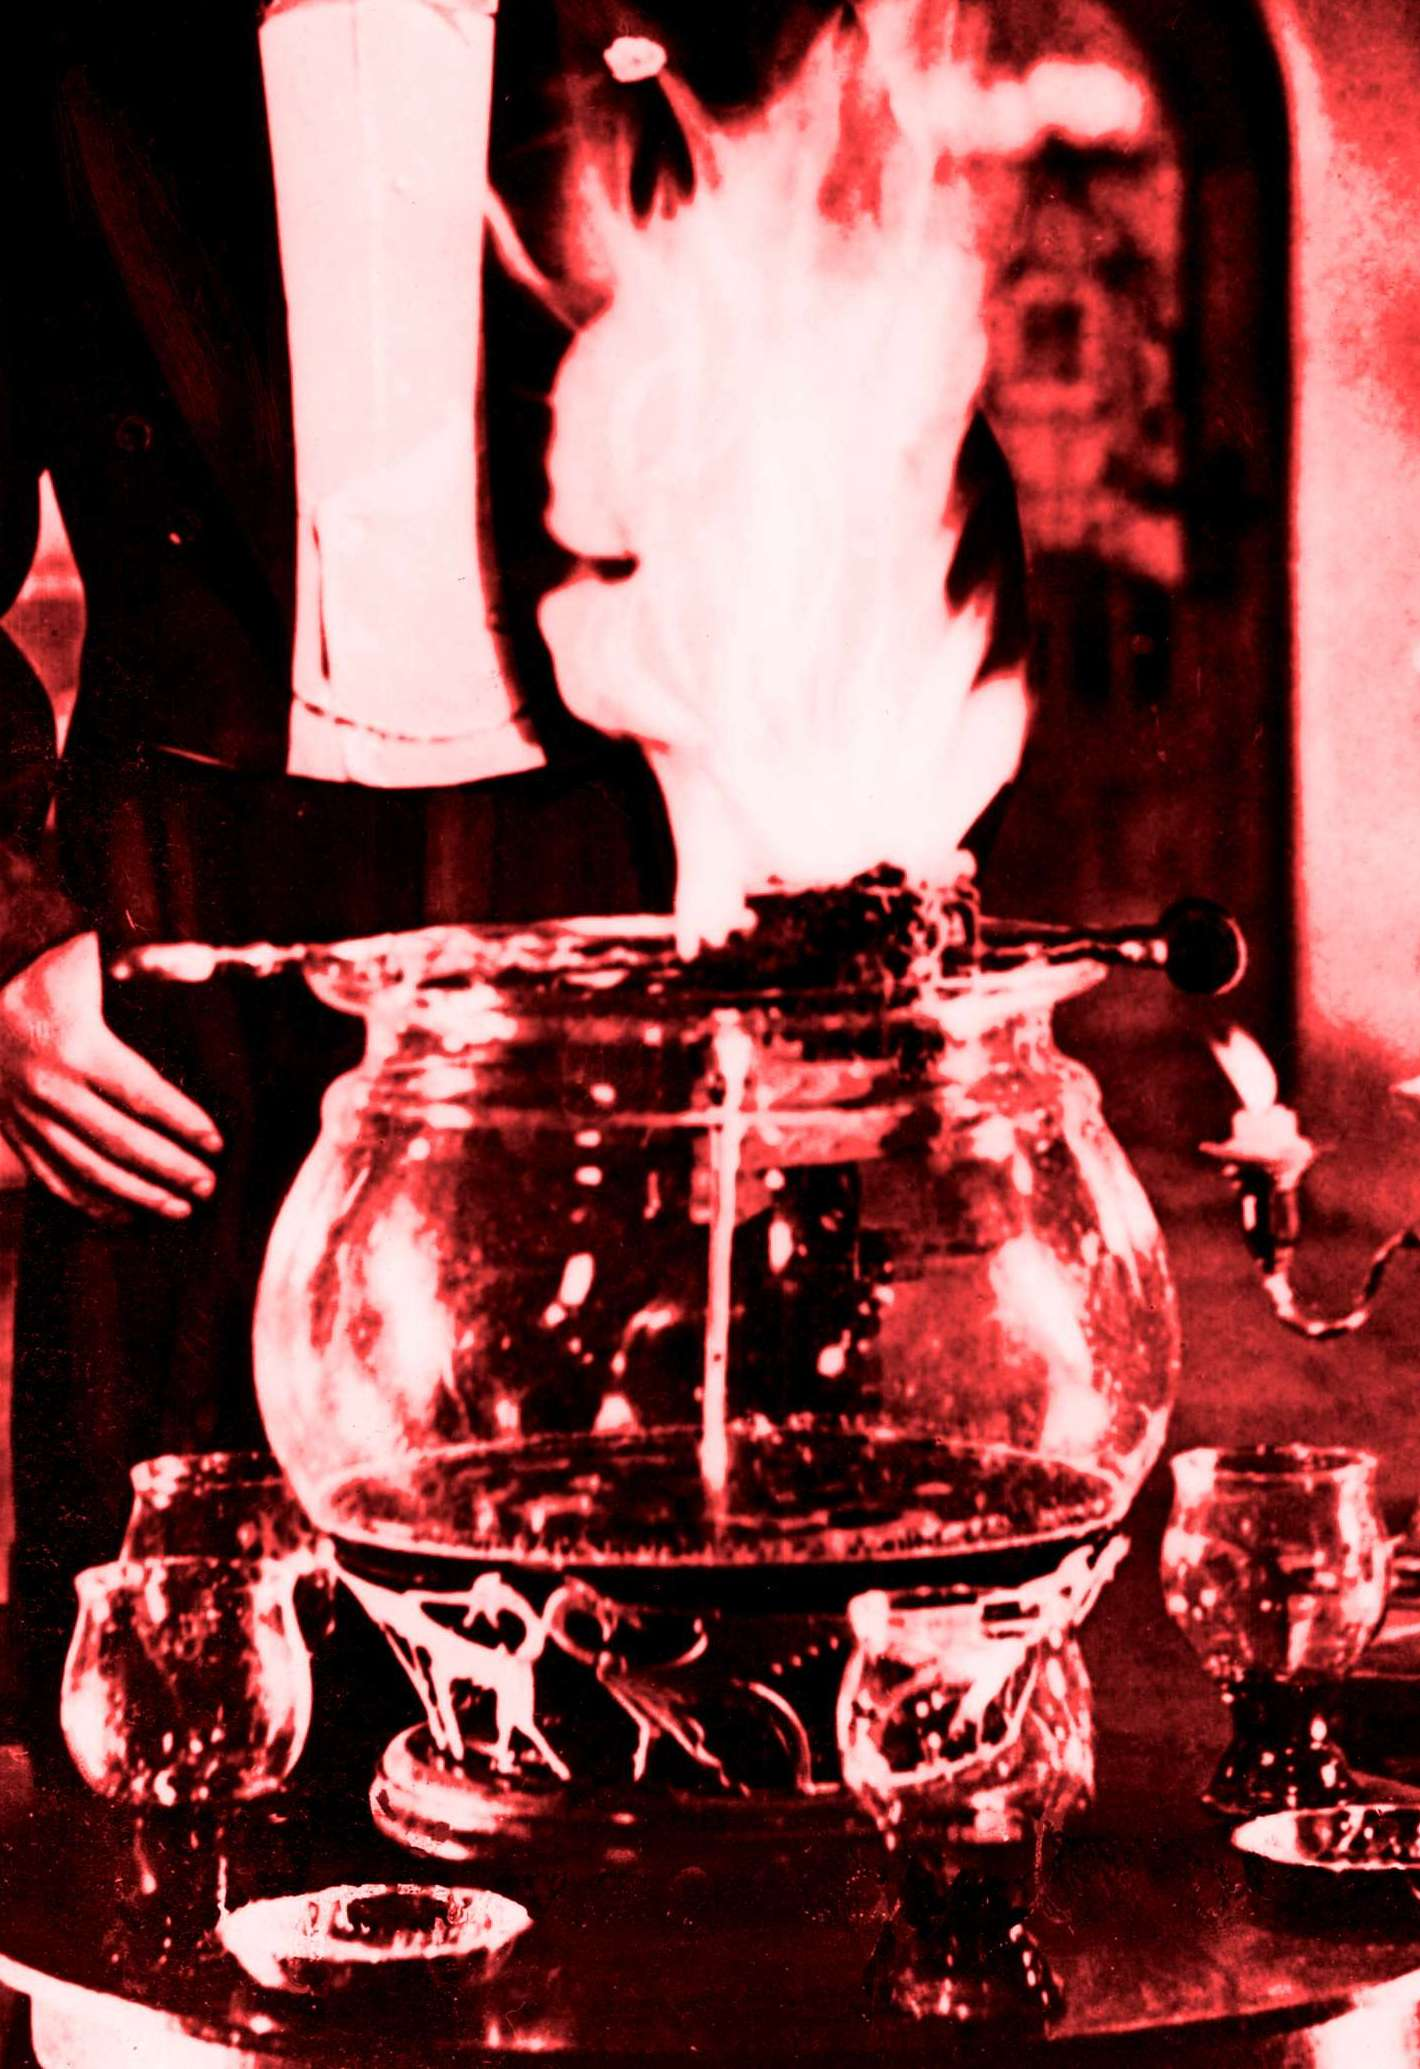 Feuerzangenbowle | Die Delikaten